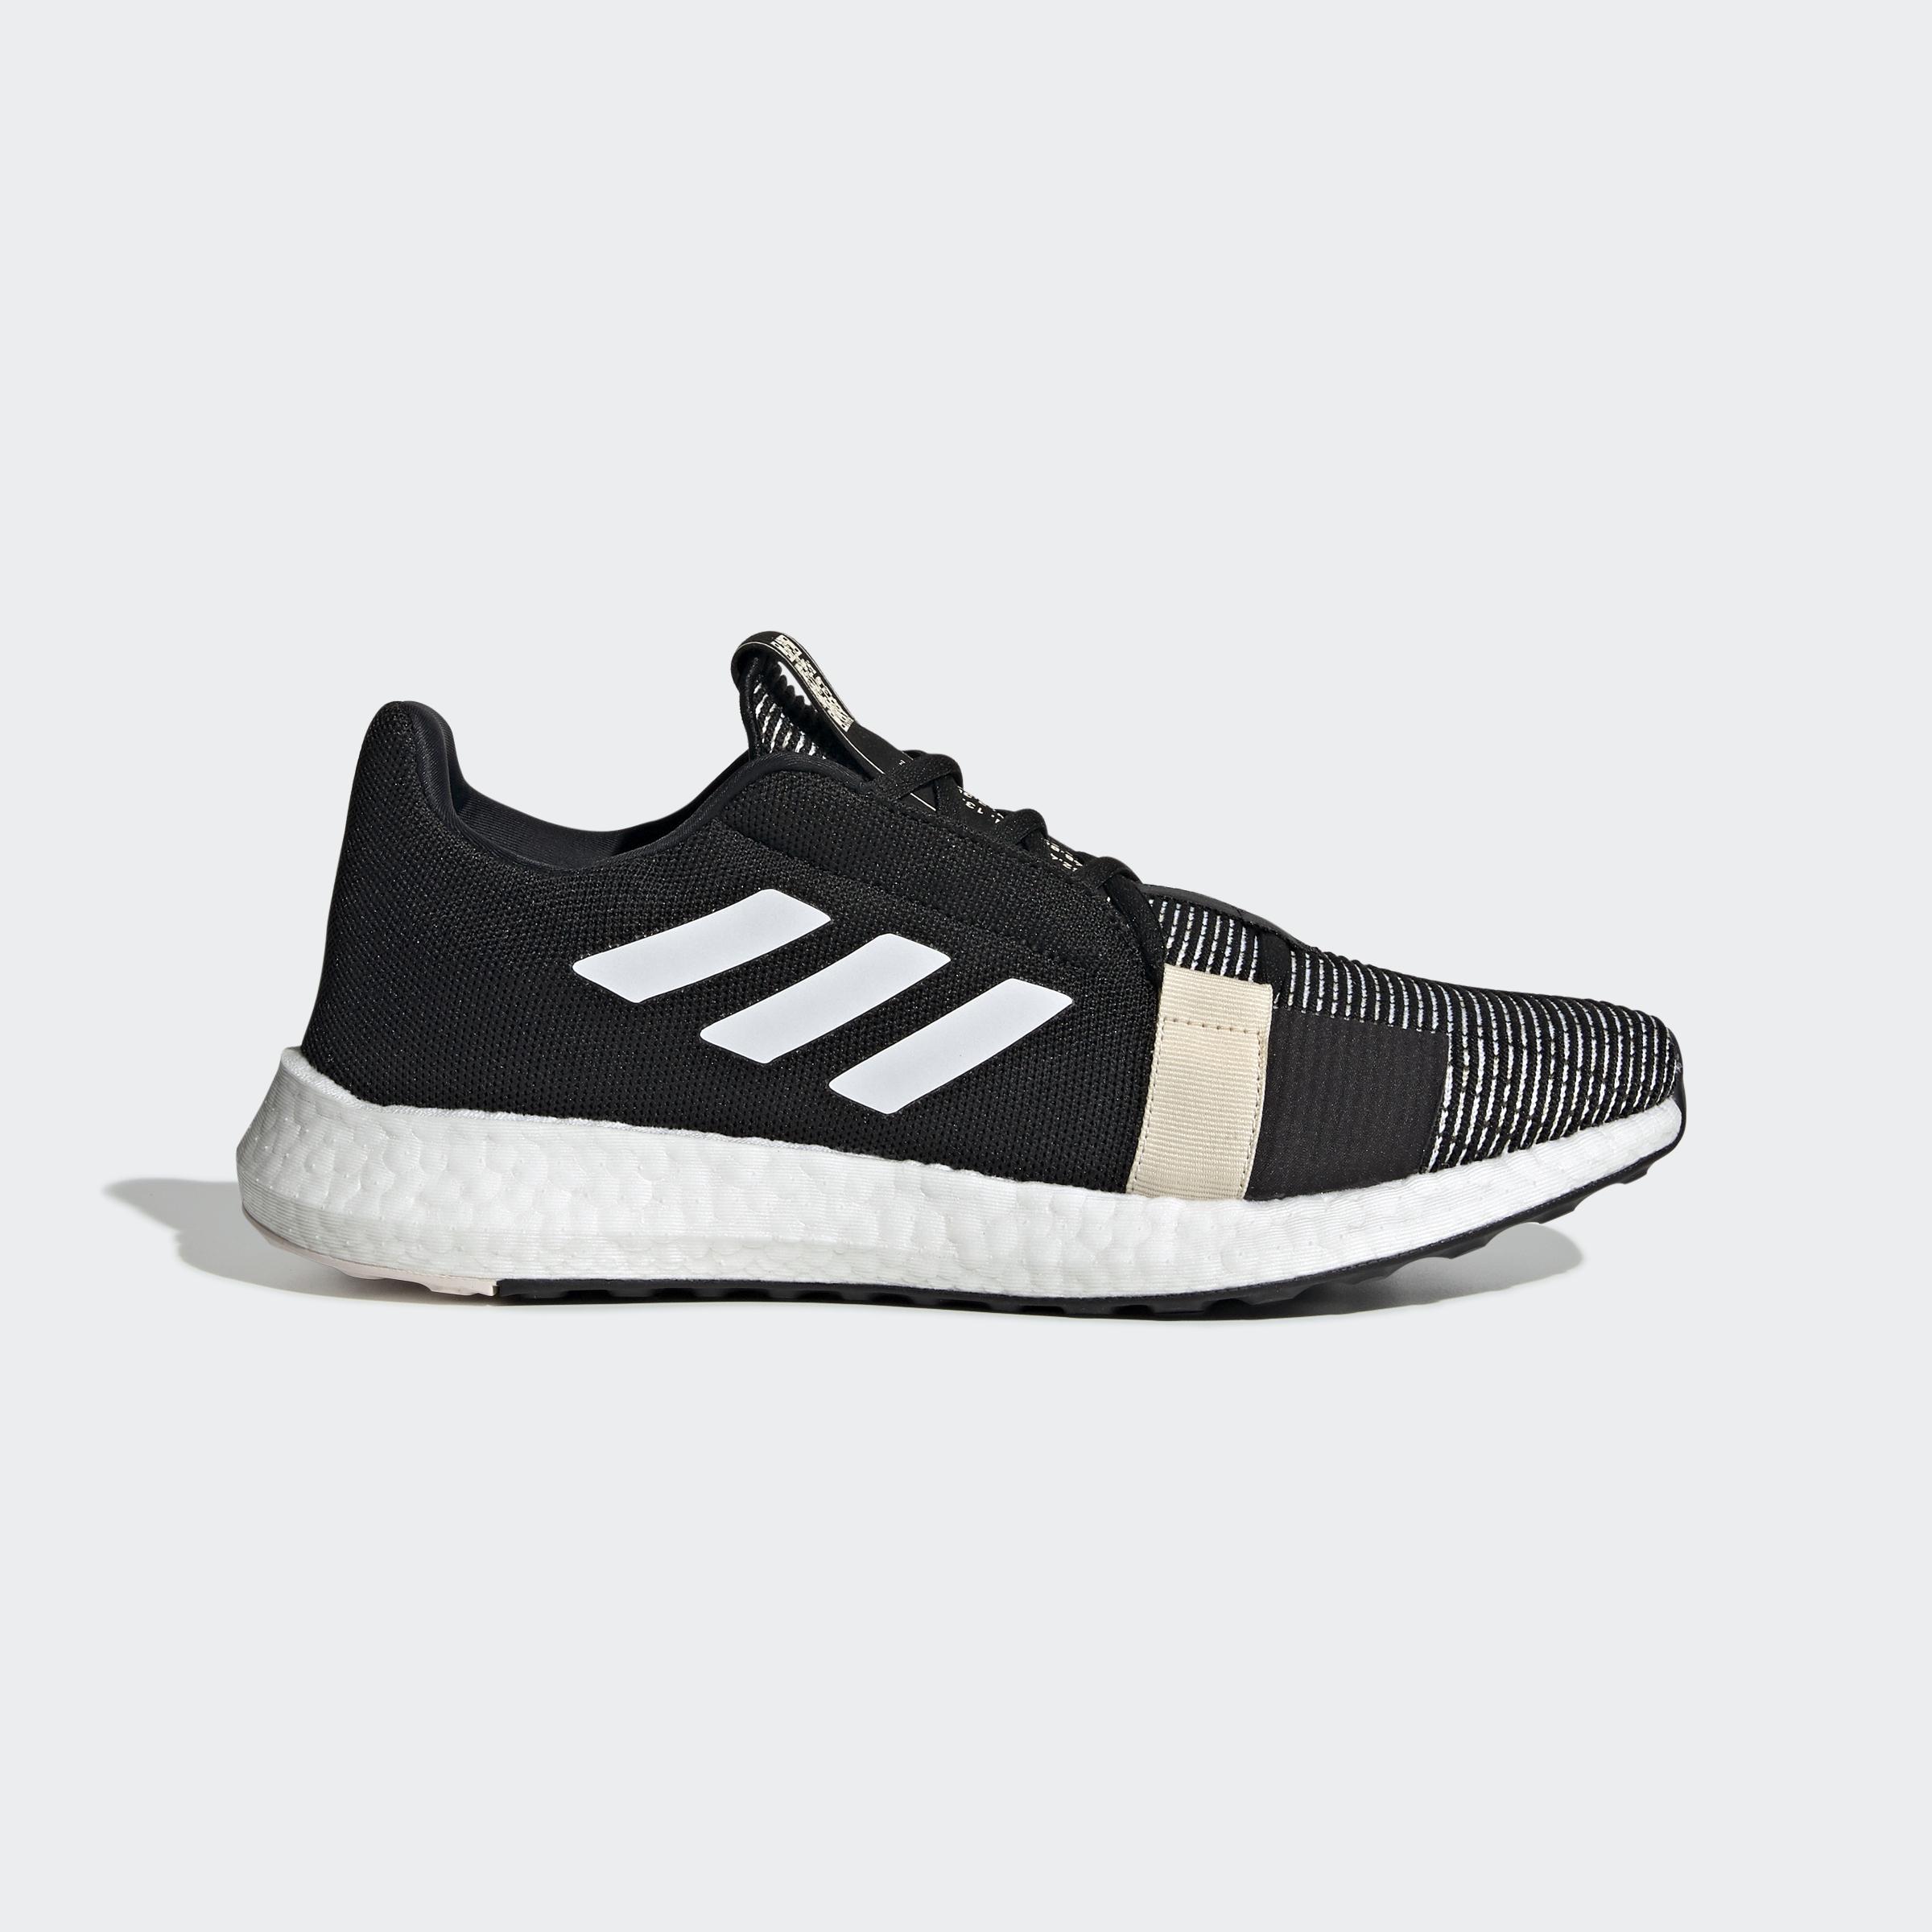 miniature 38 - adidas Senseboost Go Shoes Men's Athletic & Sneakers